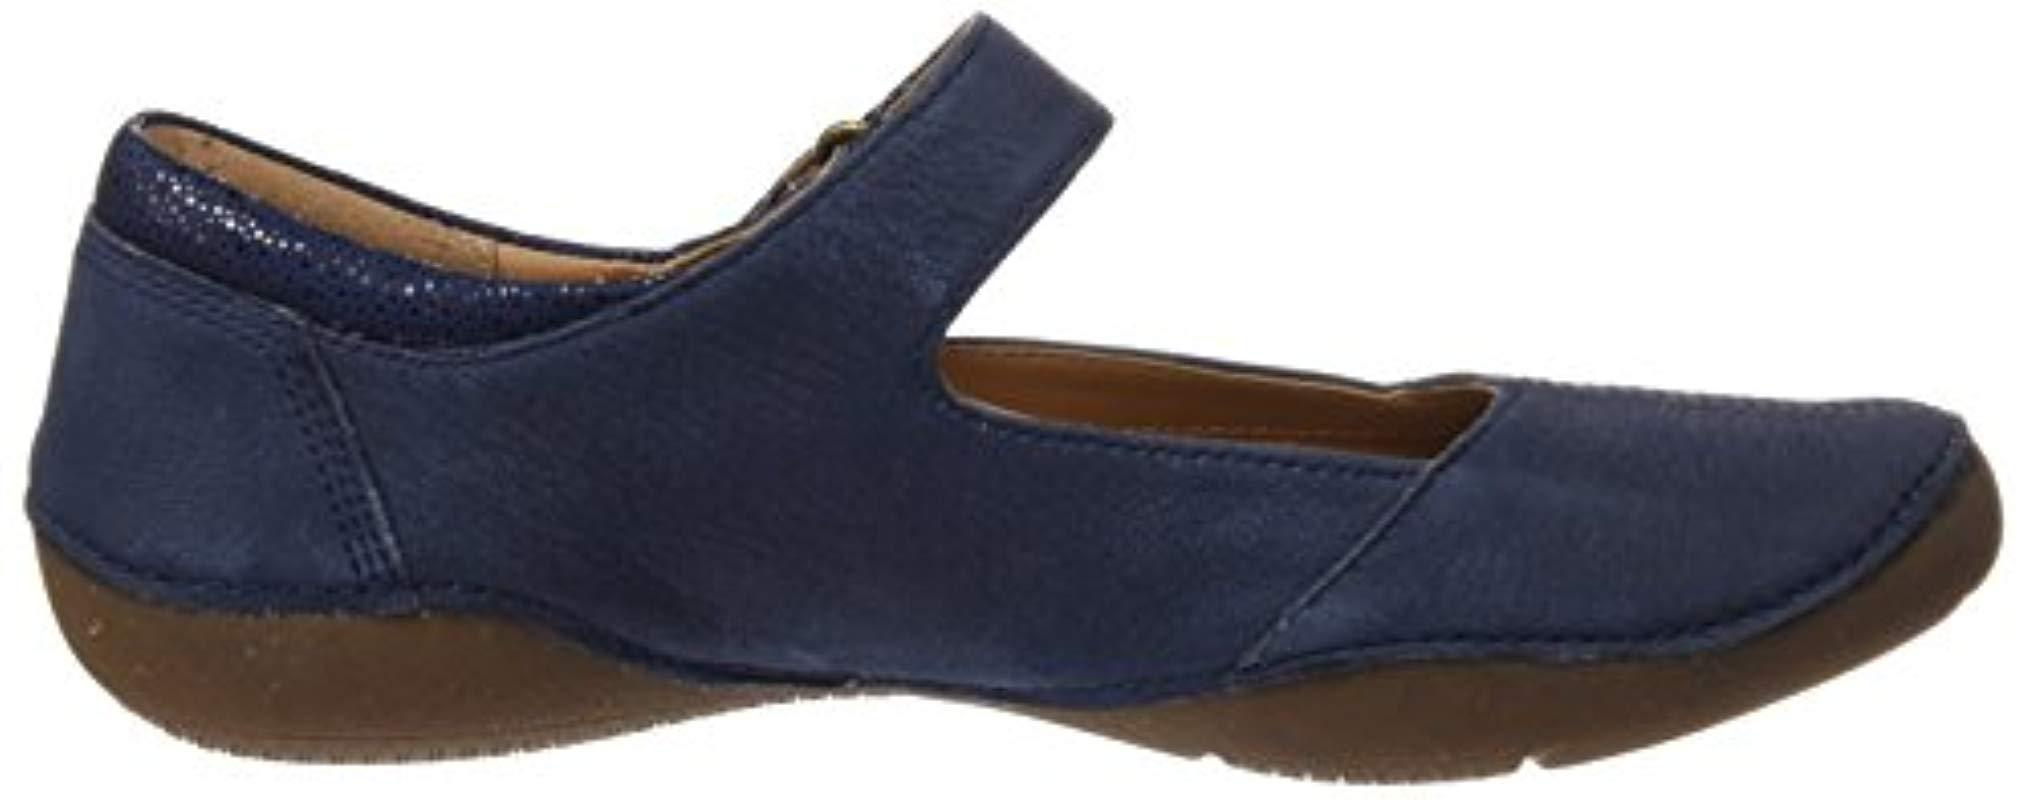 Igualmente Moviente Araña de tela en embudo  Clarks Leather Autumn Stone in Blue (Navy Nubuck) (Blue) - Lyst